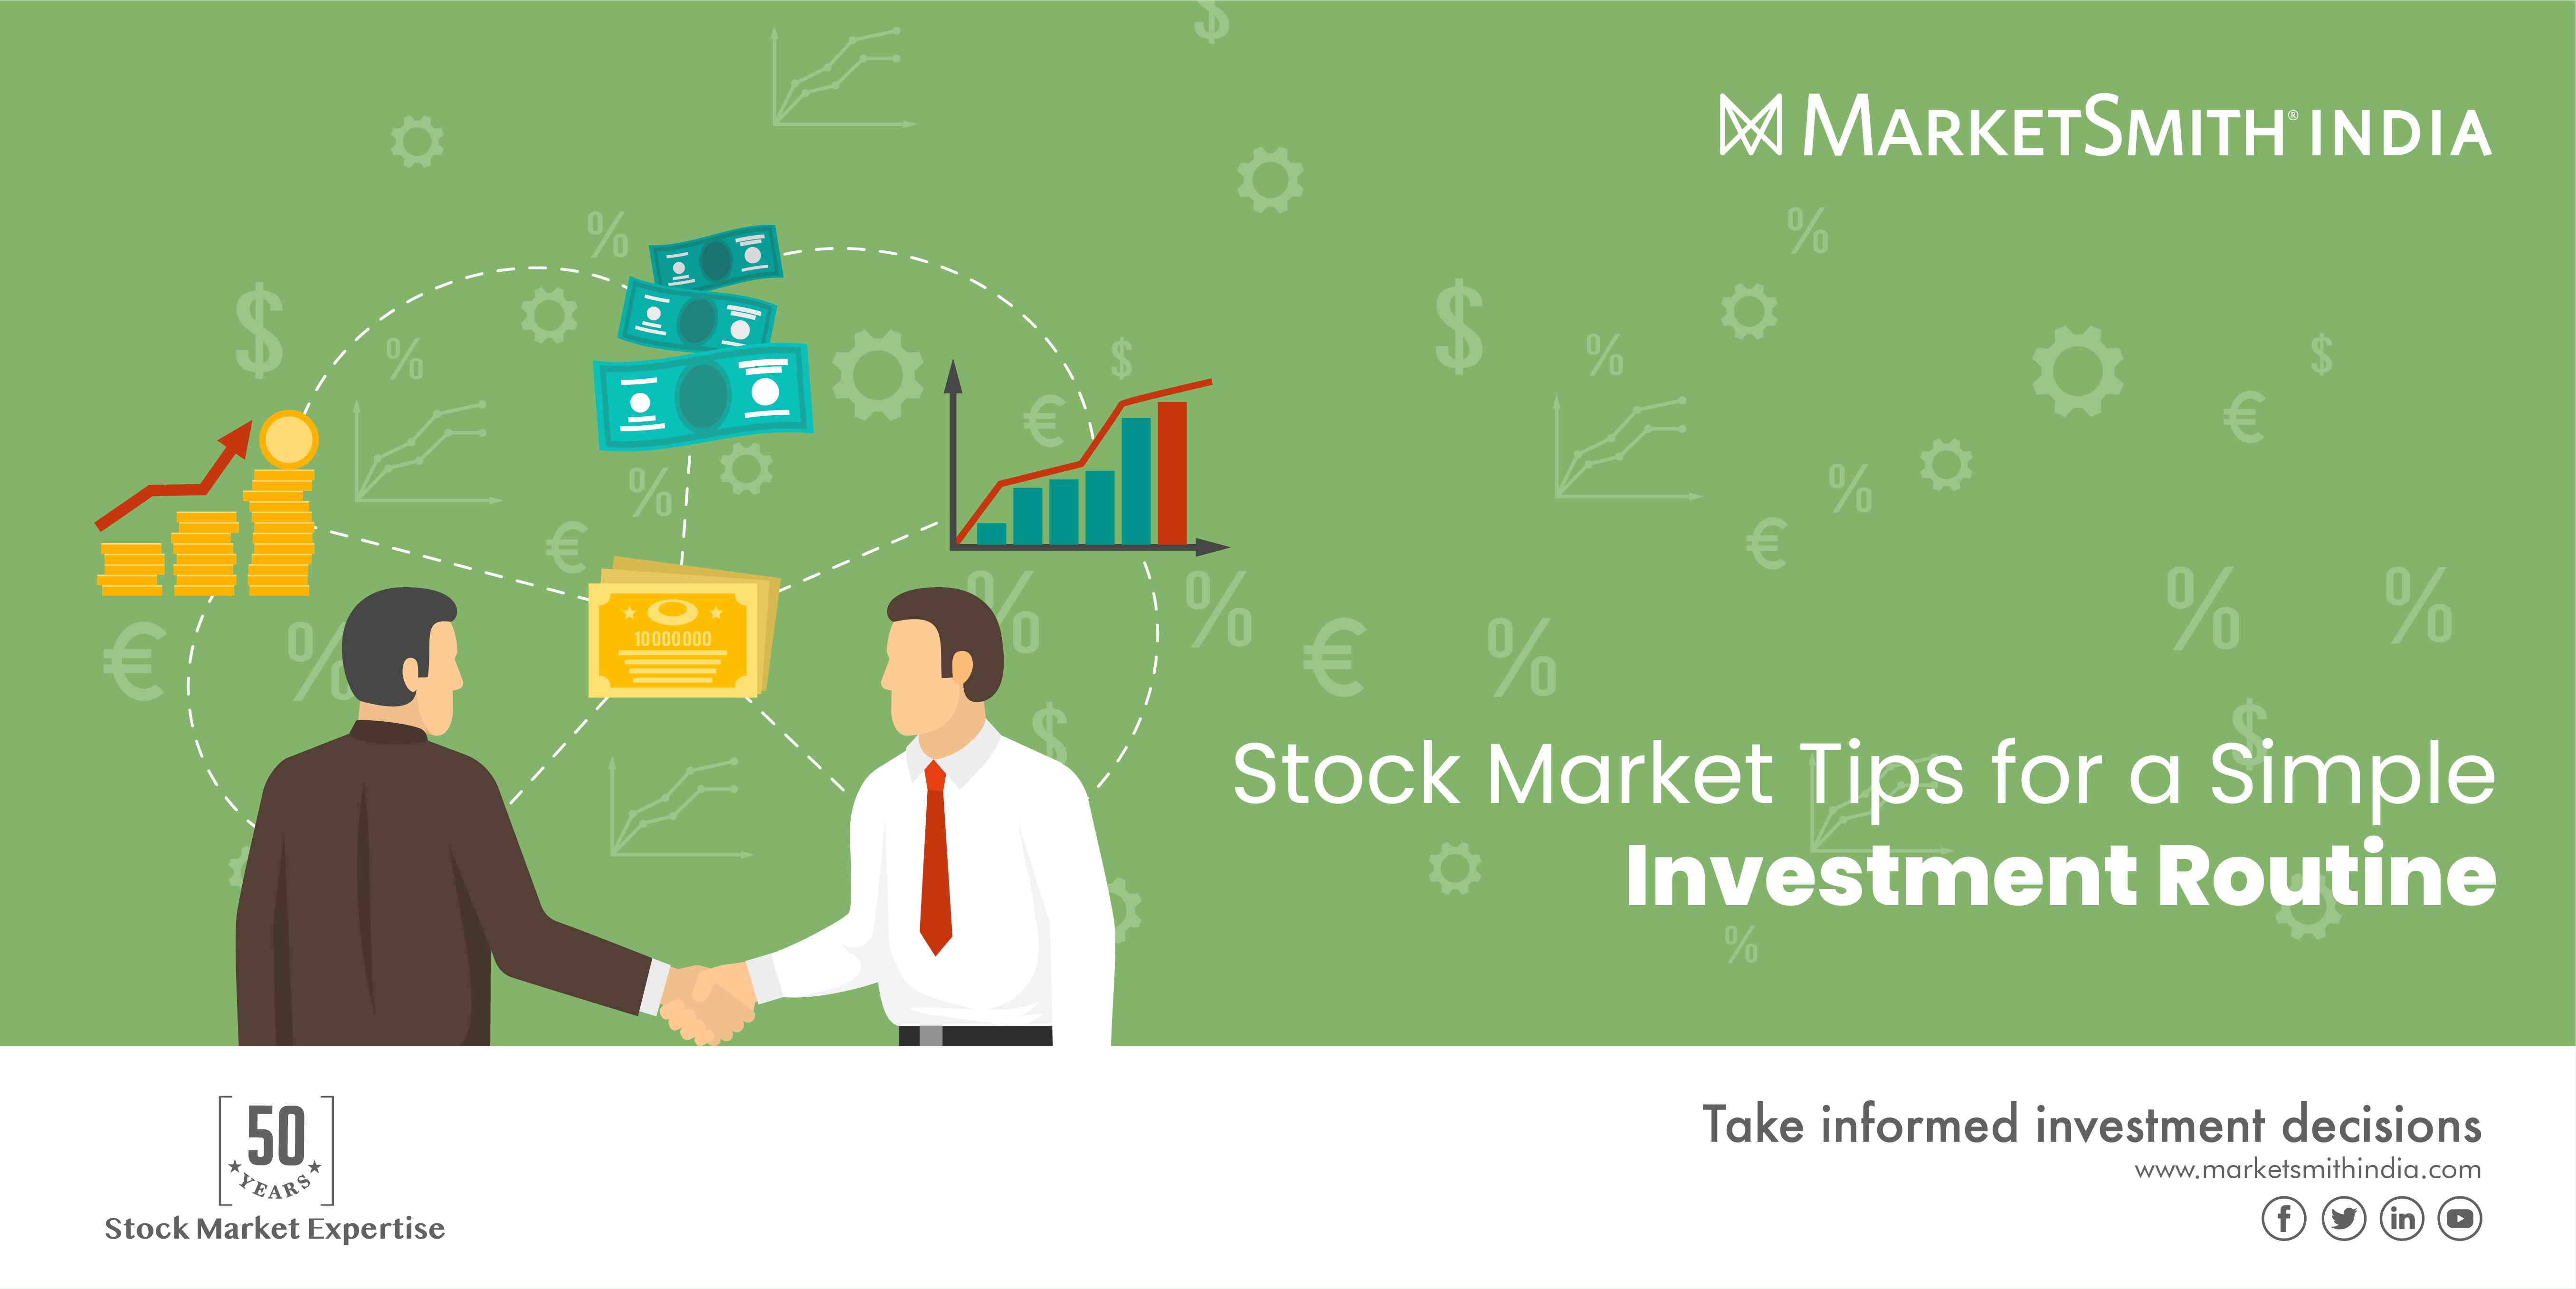 MarketSmithIndia_StockMarketTips